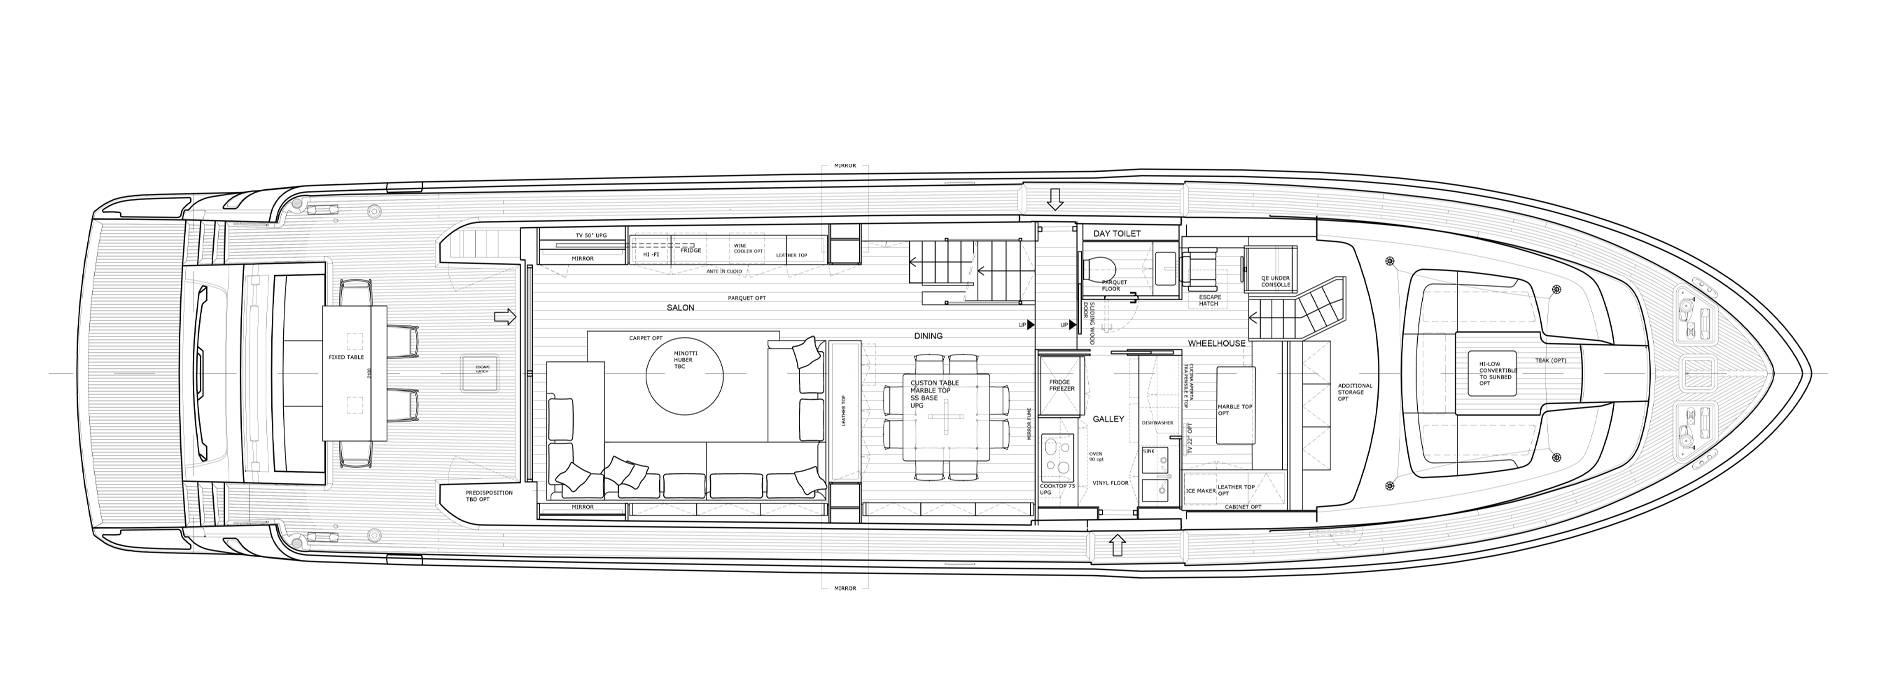 Sanlorenzo Yachts SL86-727 Hauptdeck